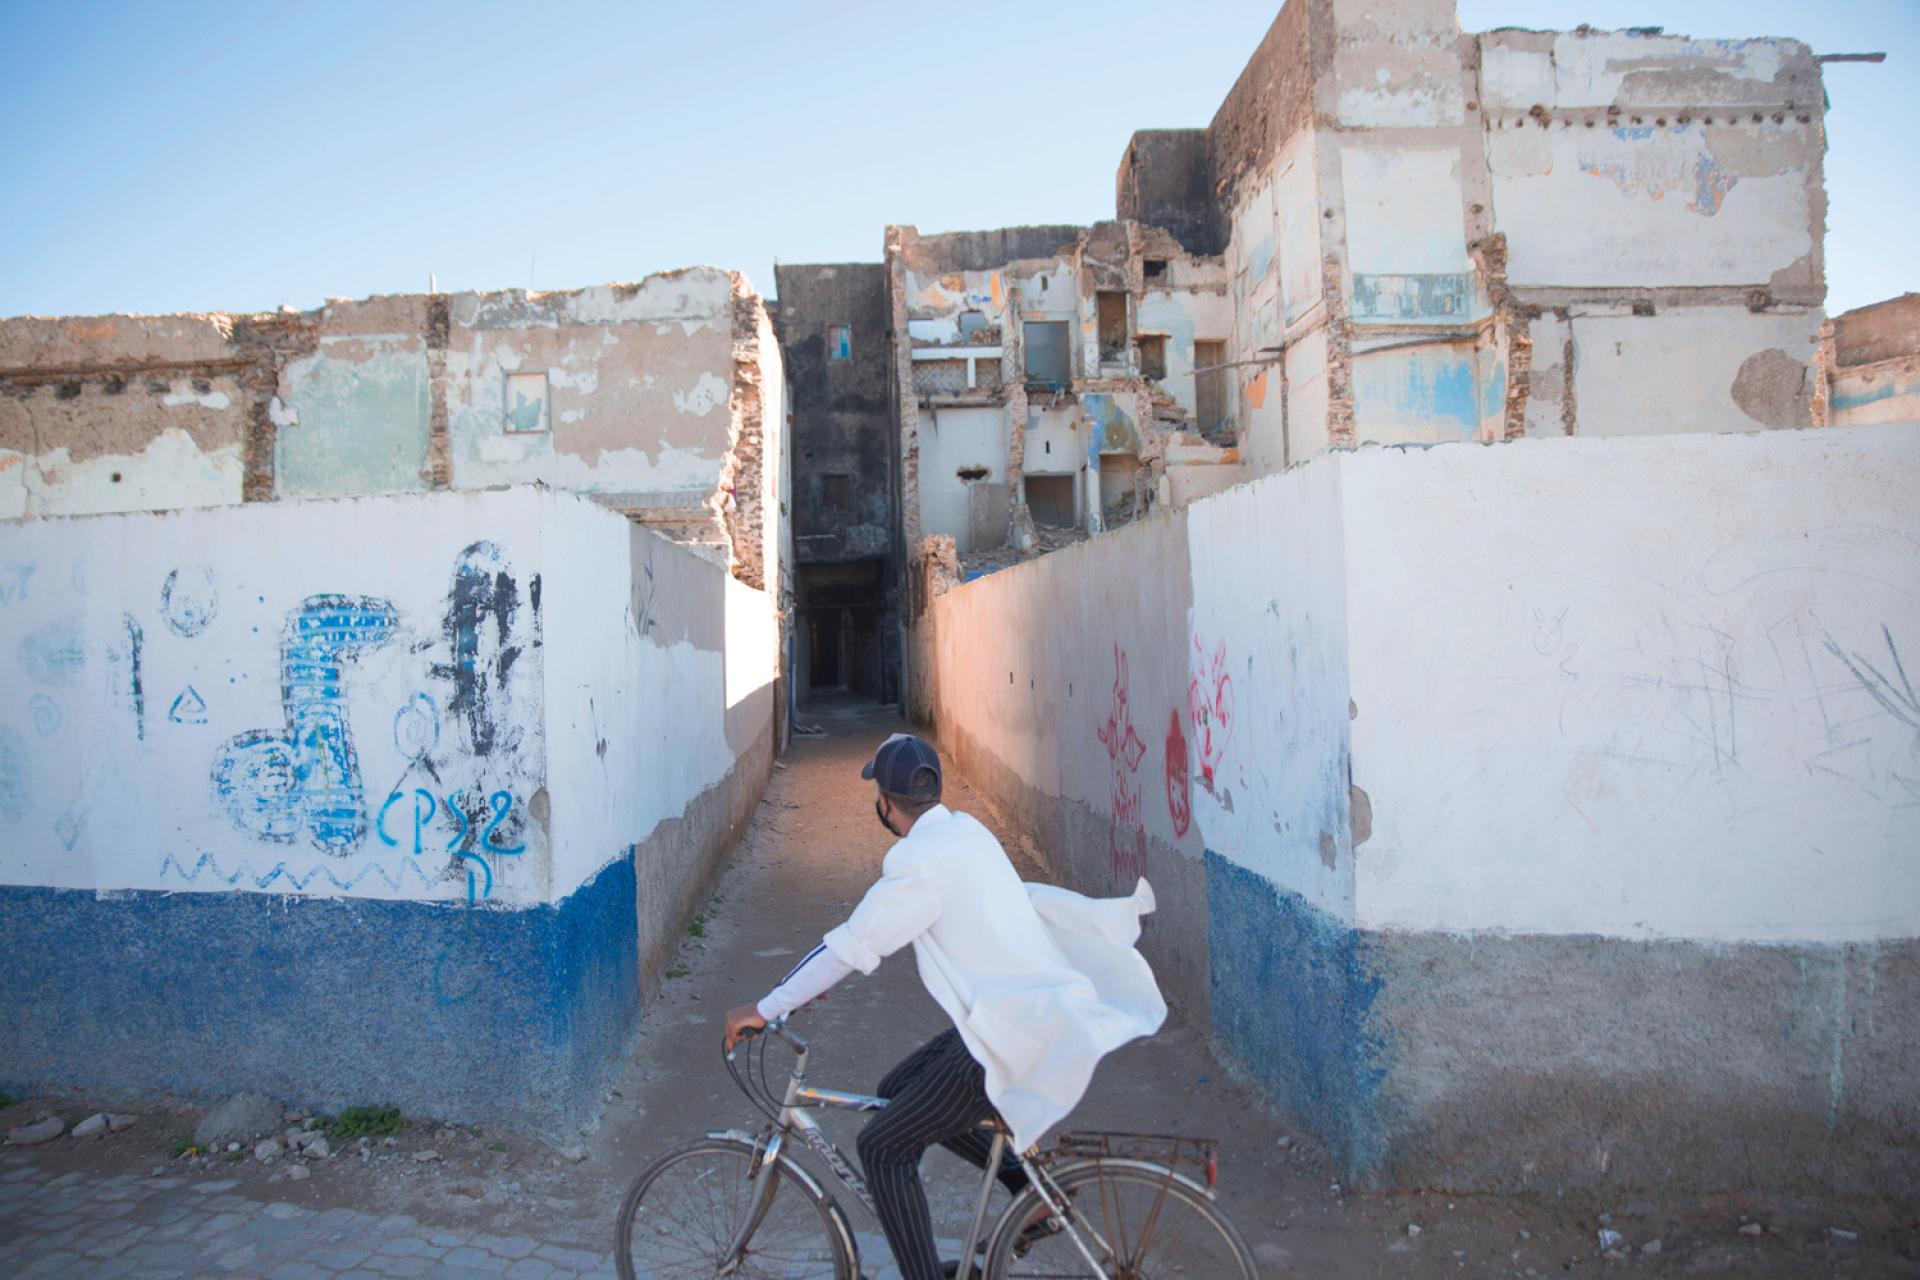 A l'entrée de l'ancien mellah (quartier juif), à Essaouira, l'ancienne Mogador.